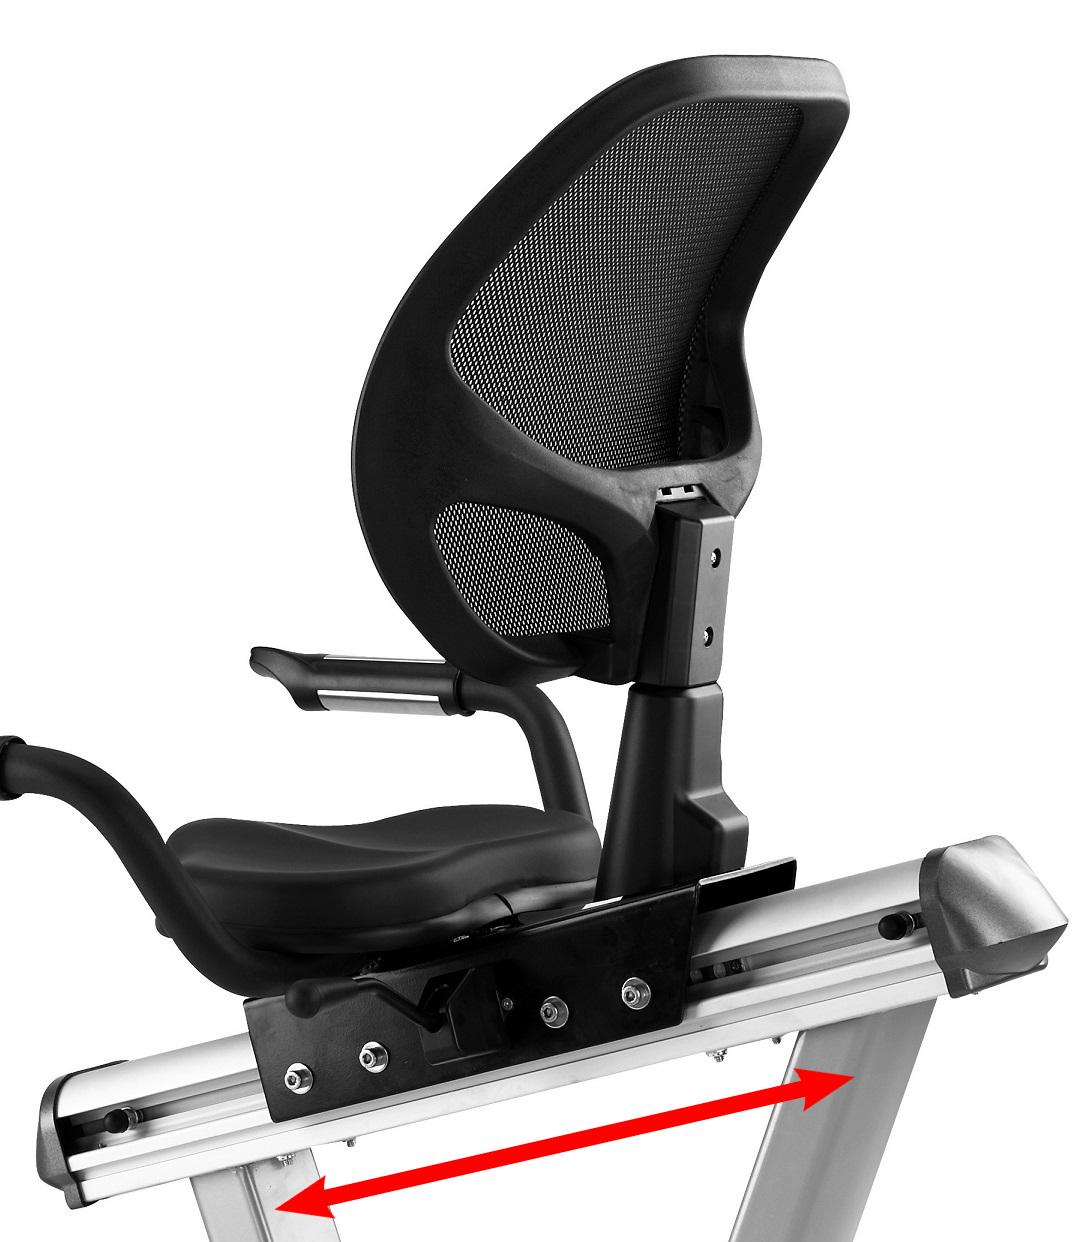 BH Fitness LK7550 SmartFocus sedlo